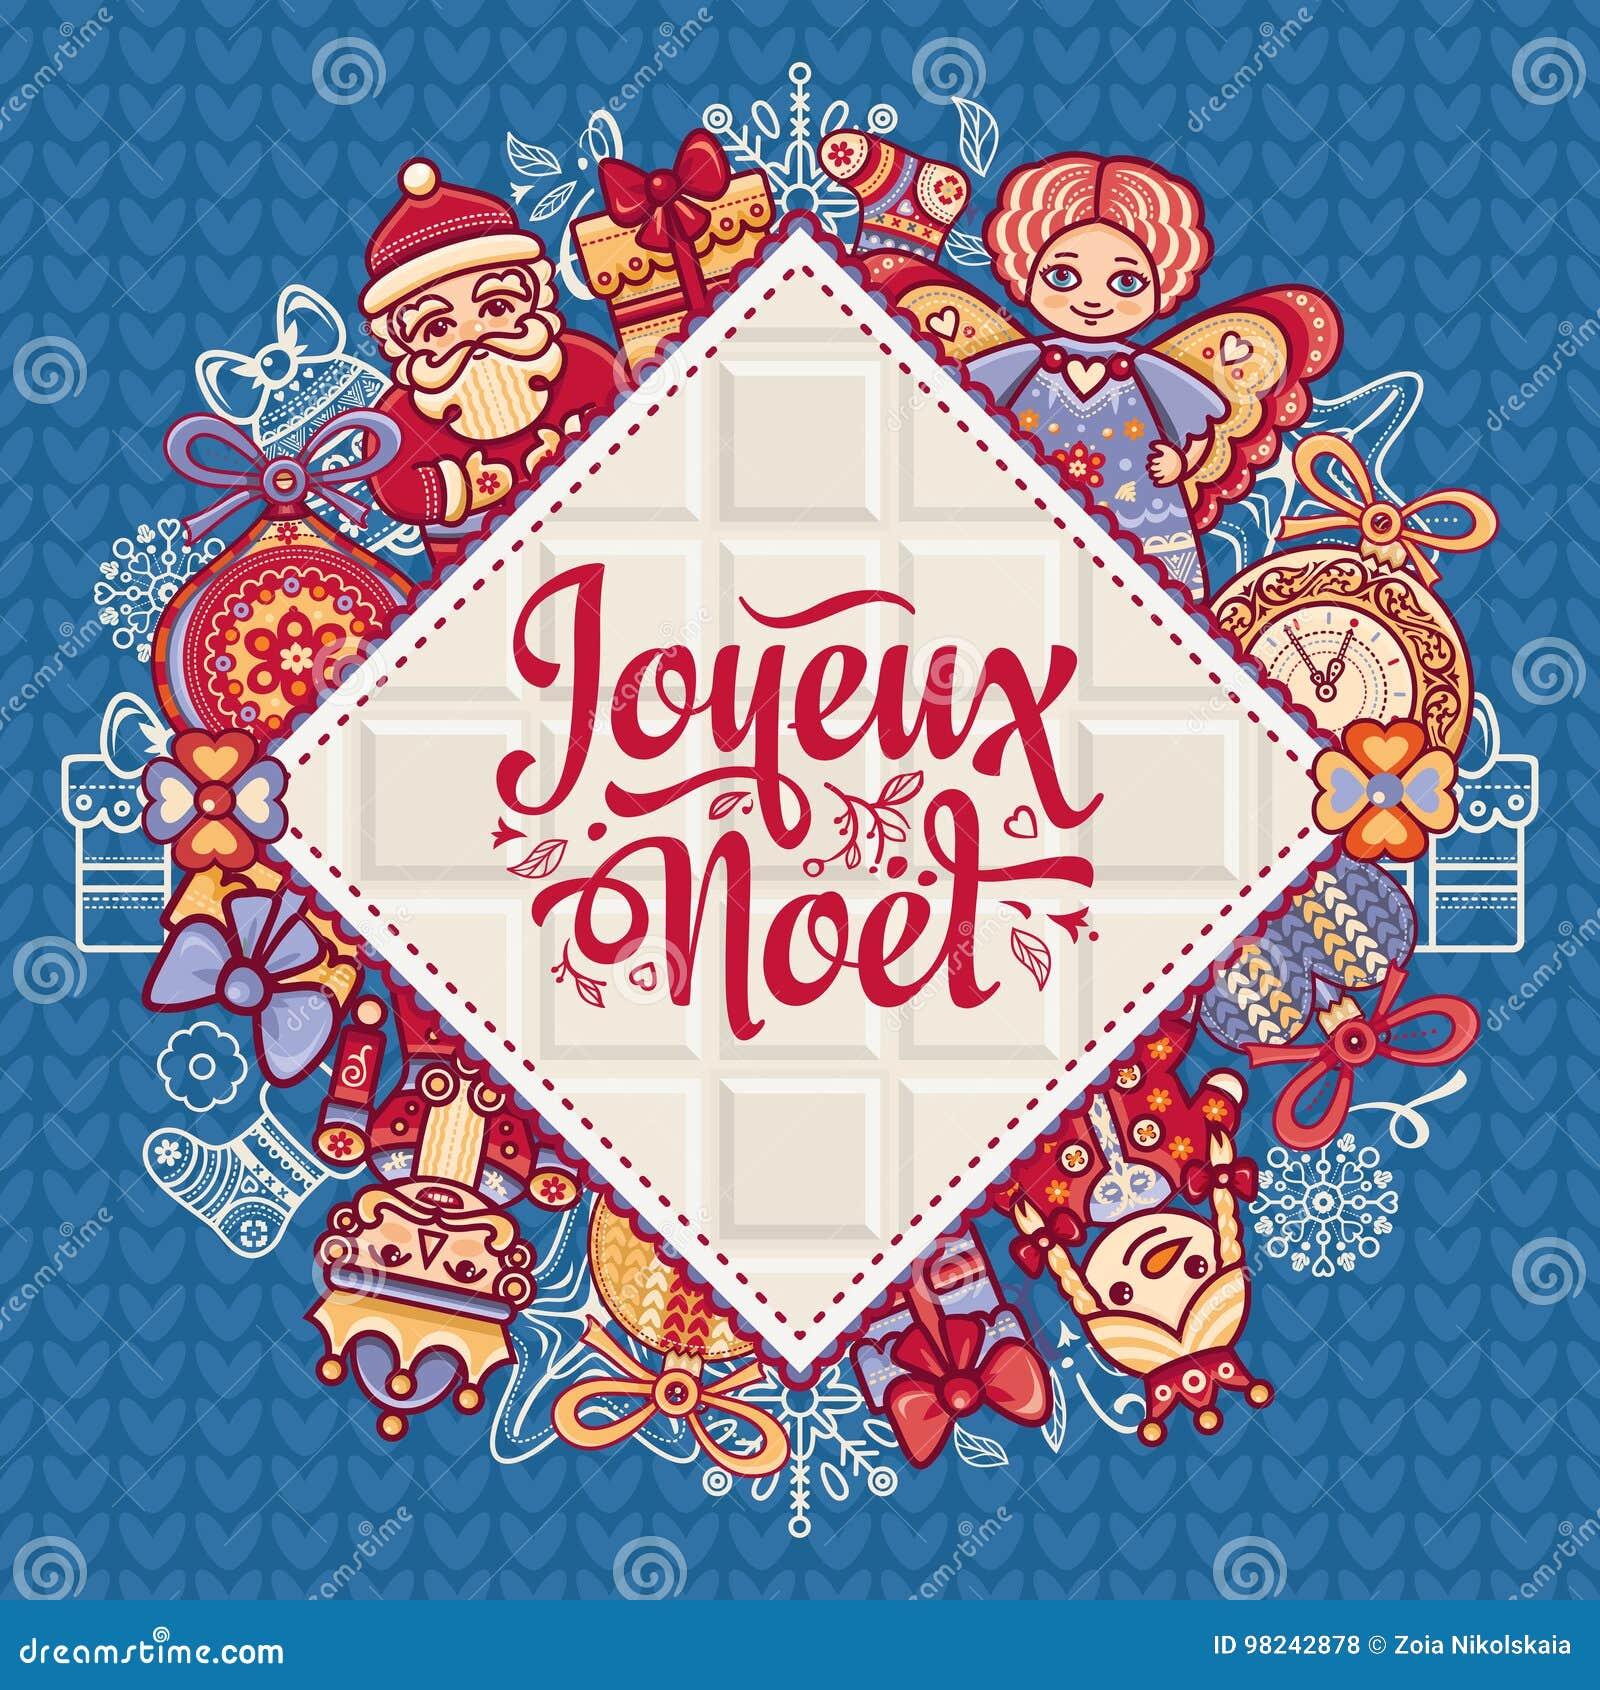 French Merry Christmas Joyeux Noel Greeting Card Stock Vector